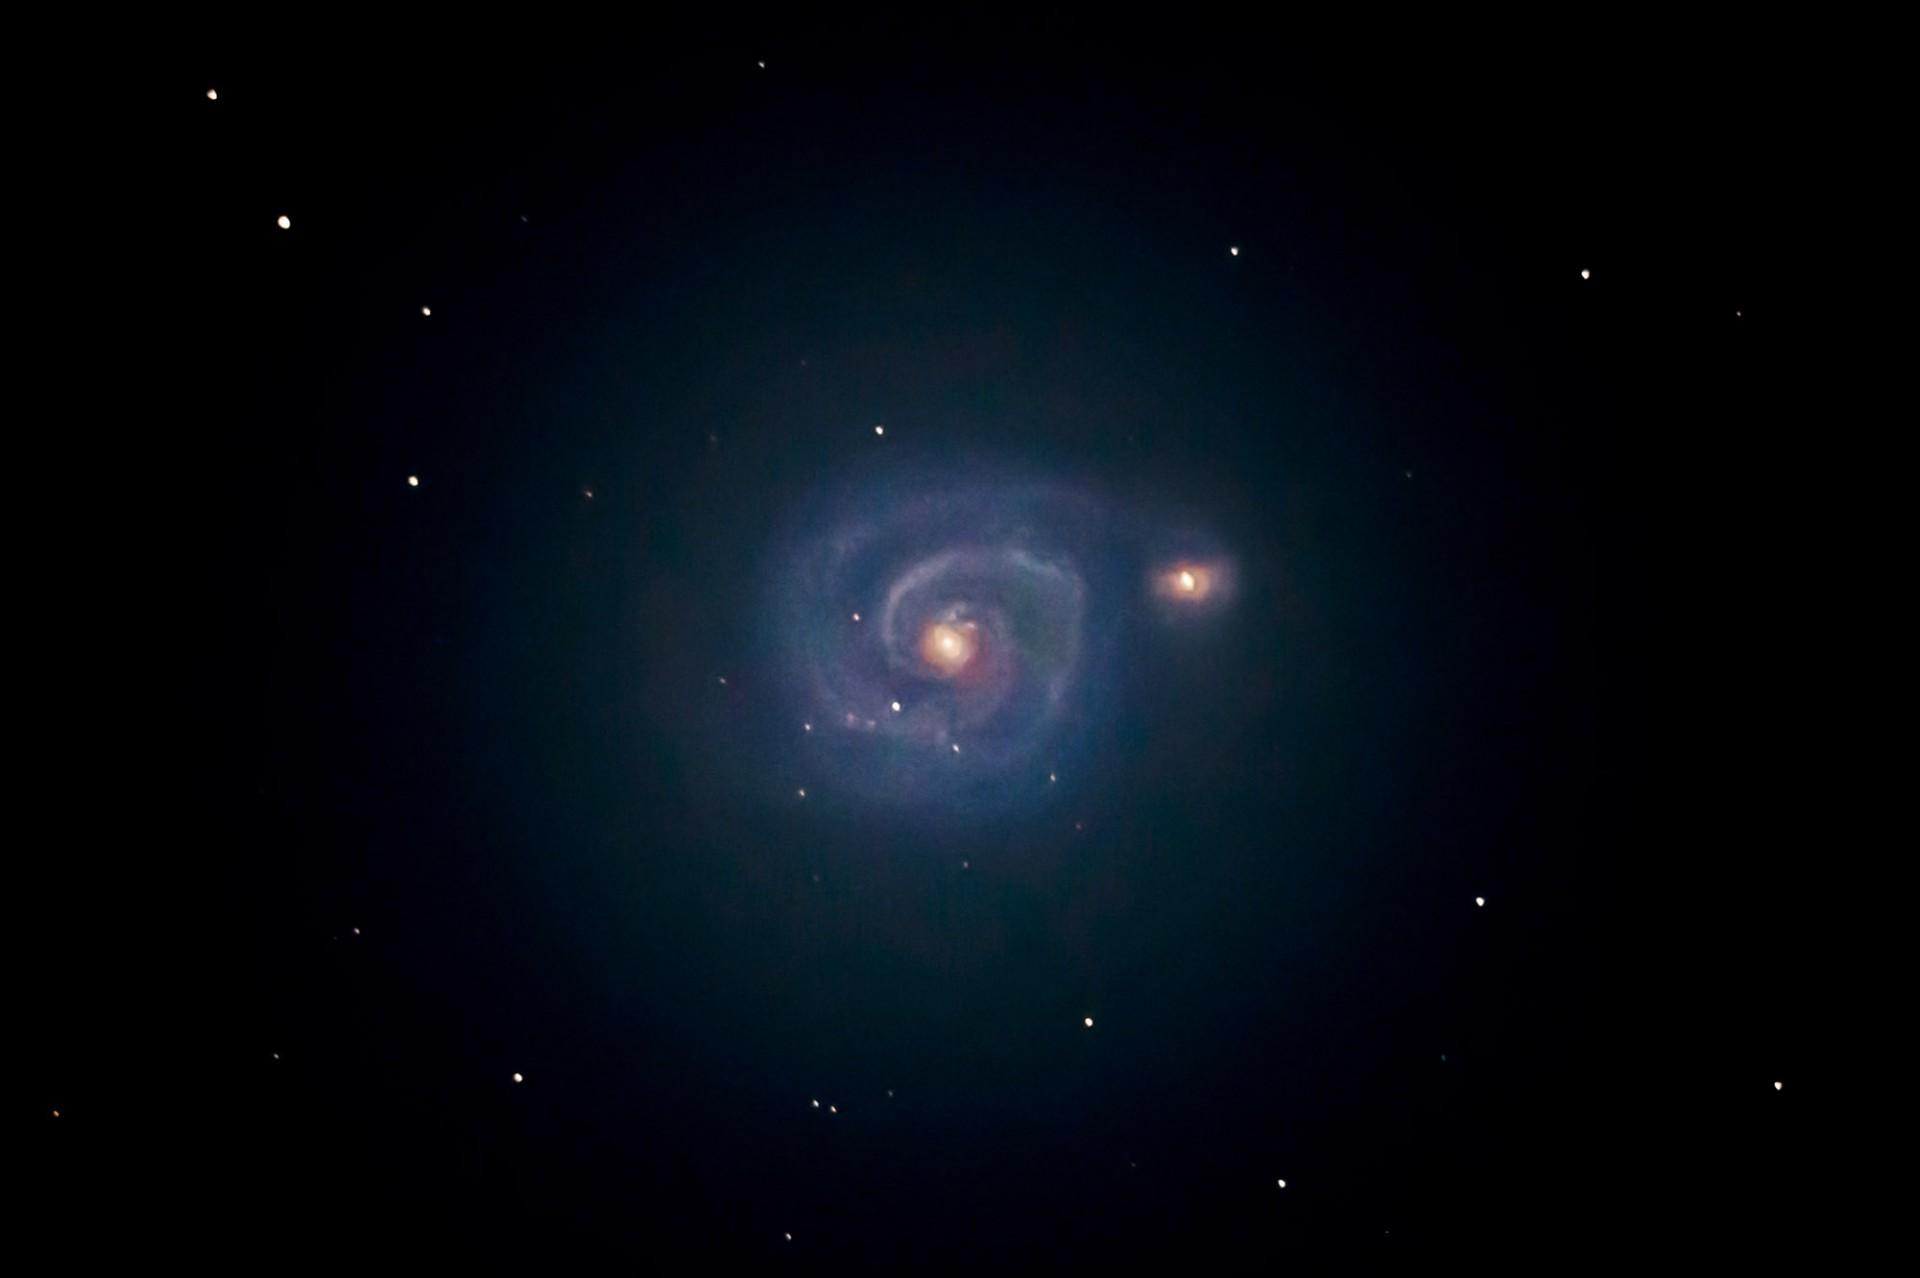 Whirlpool Galaxy (M 51)